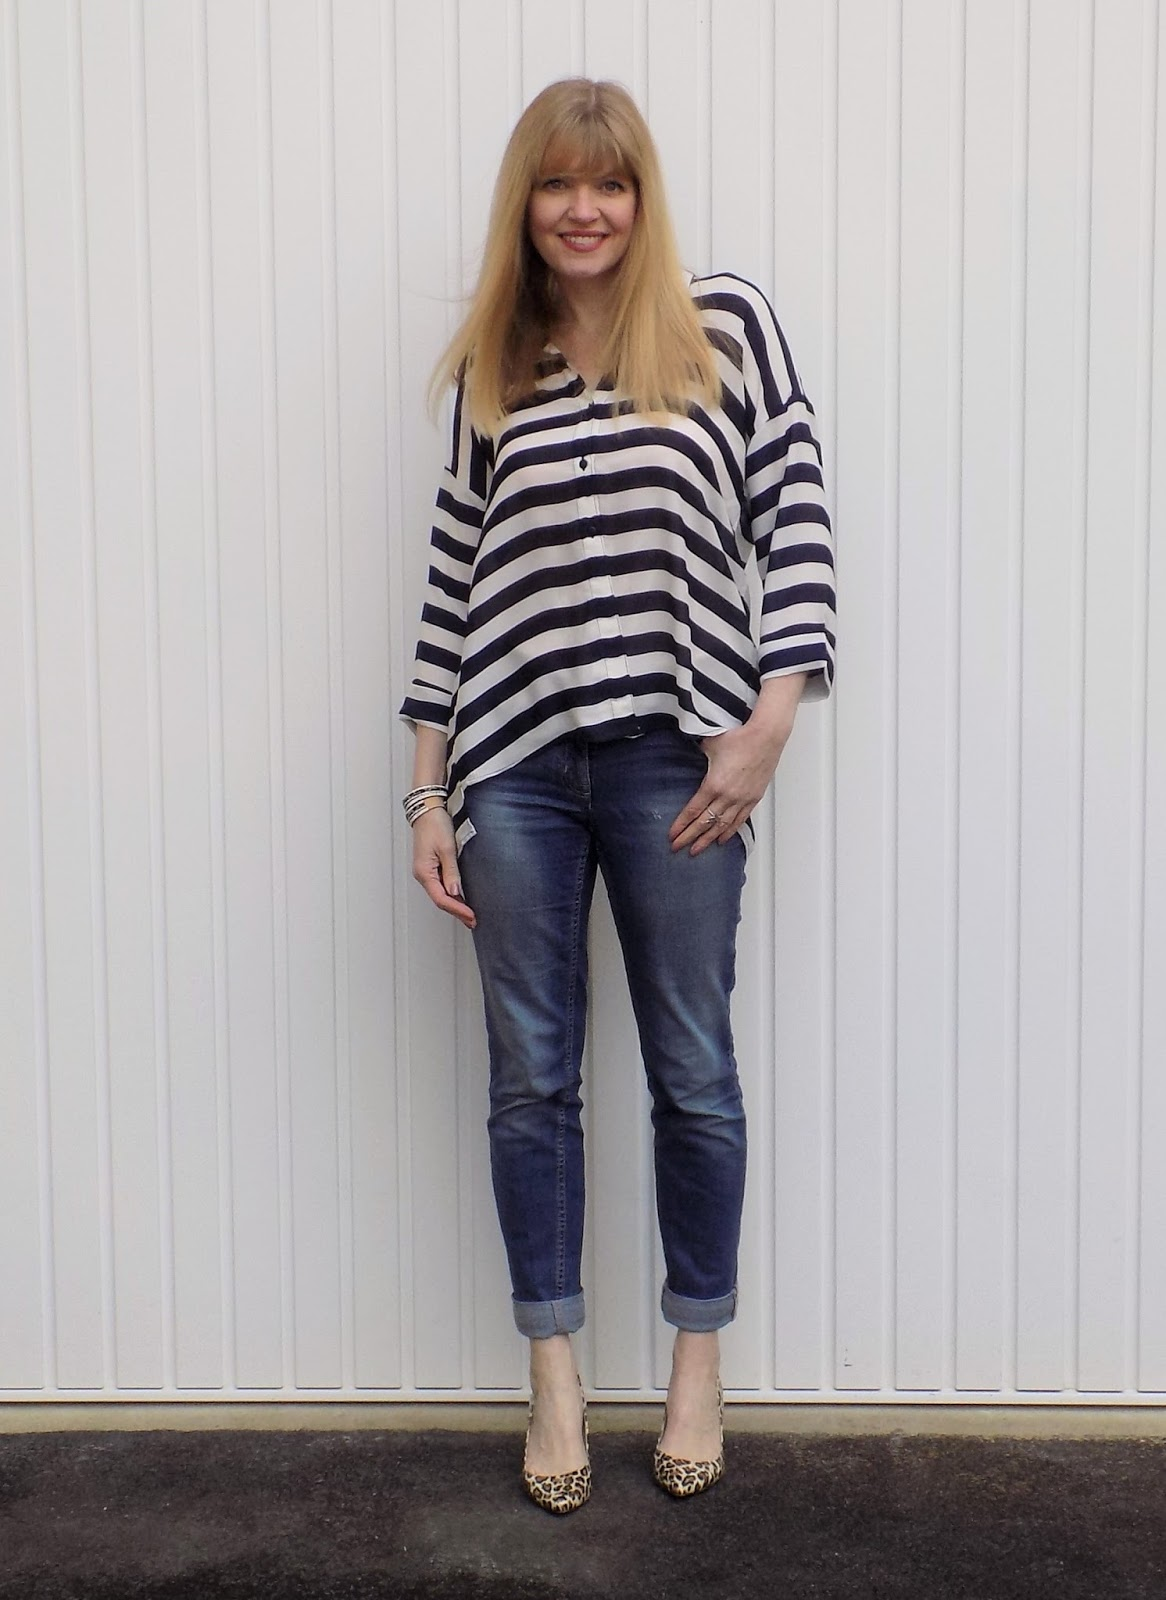 Striped shirt, boyfriend jeans and leopard print shoes